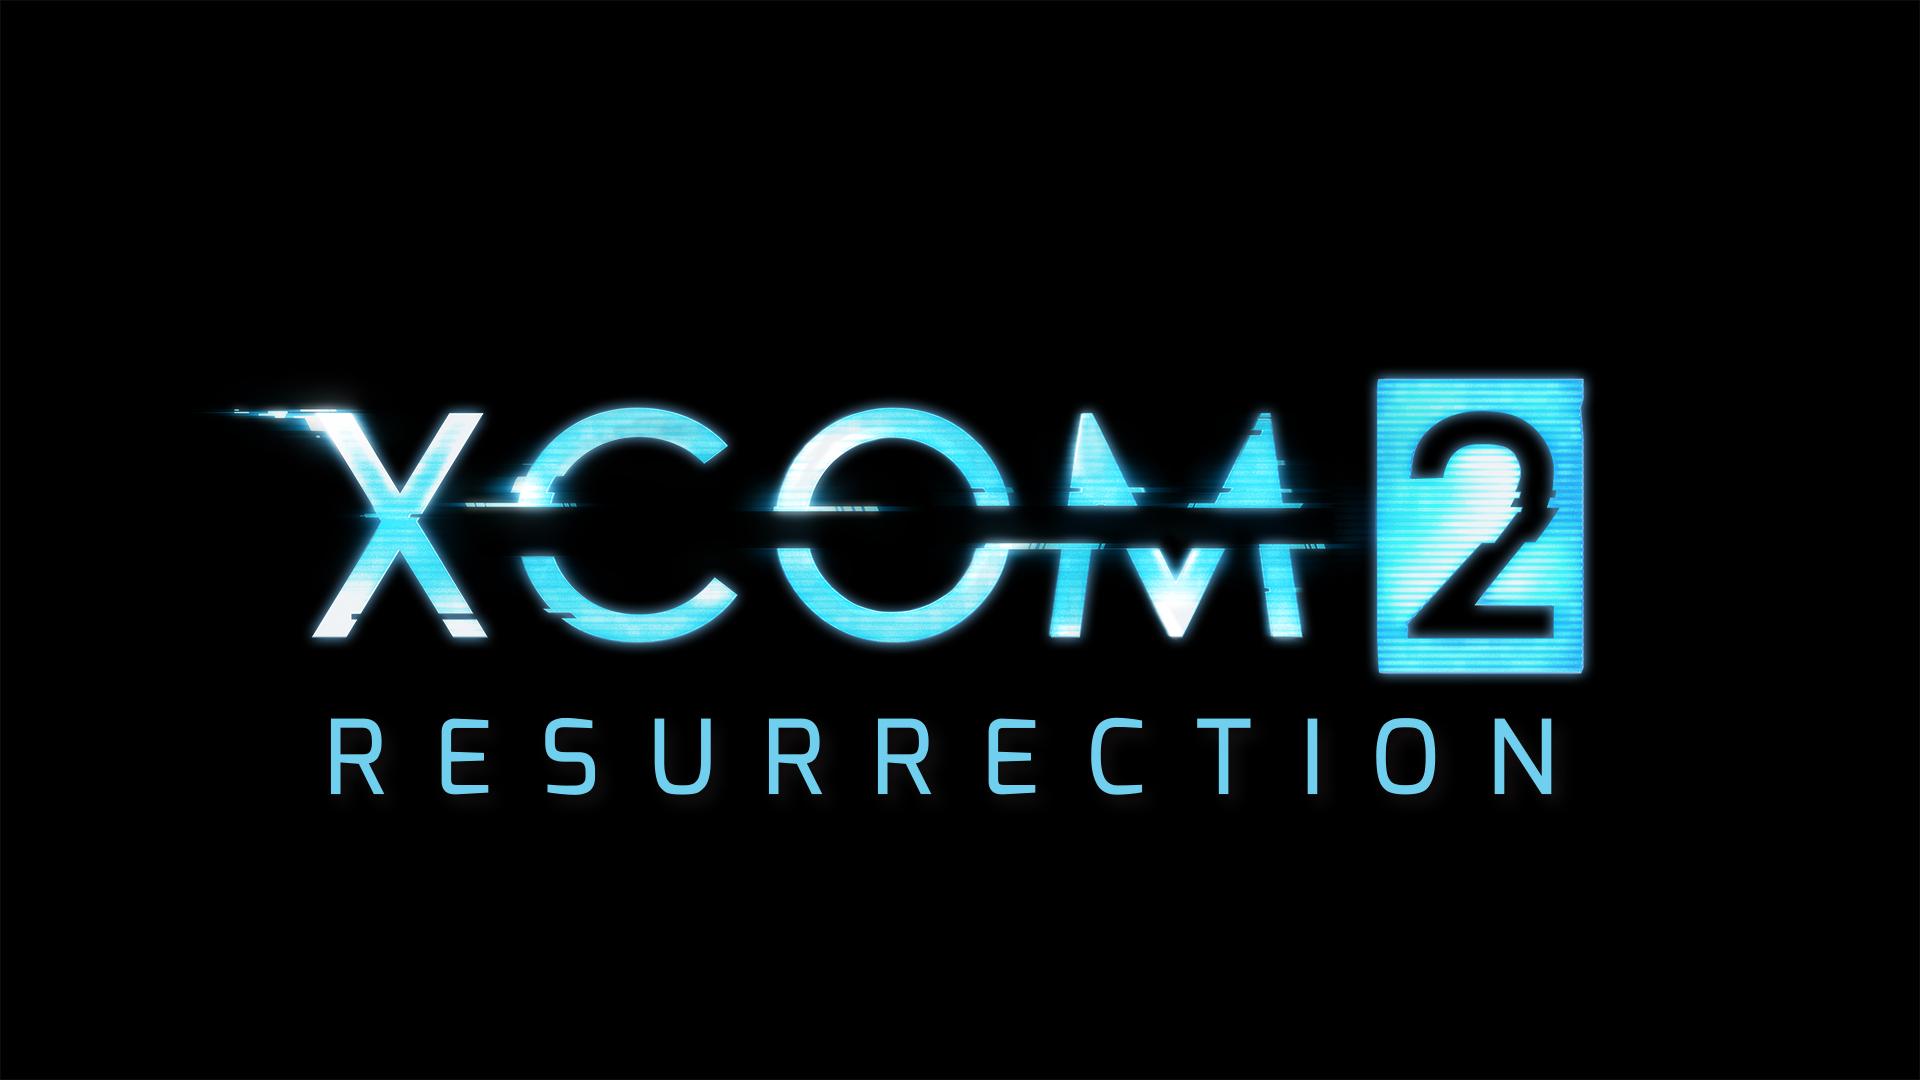 Xcom Resurrection